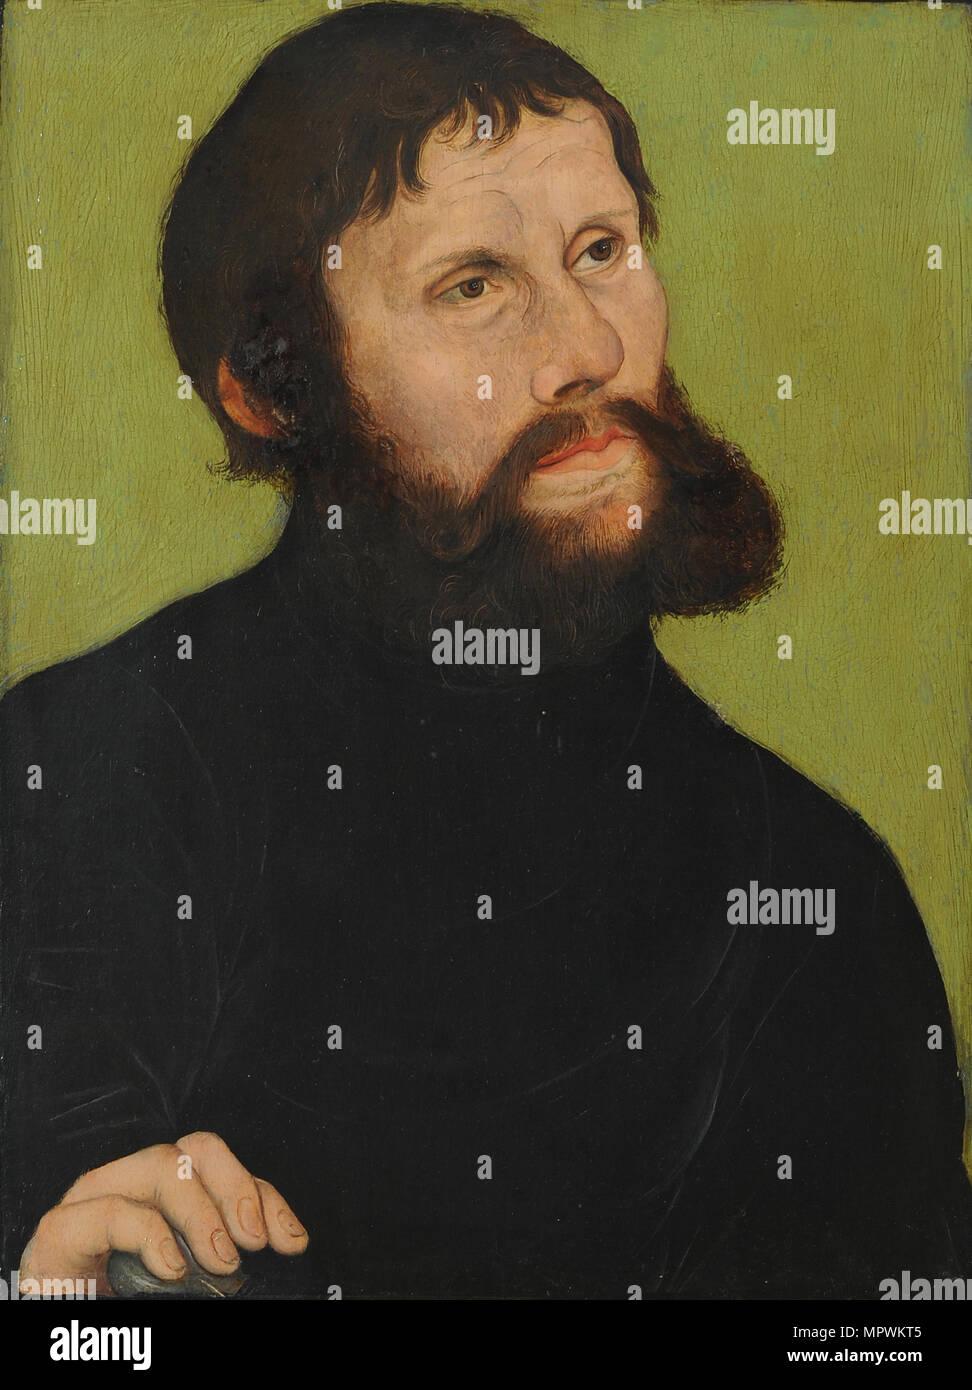 Portrait of Luther (1483-1546) as Junker Jörg, 1521. - Stock Image